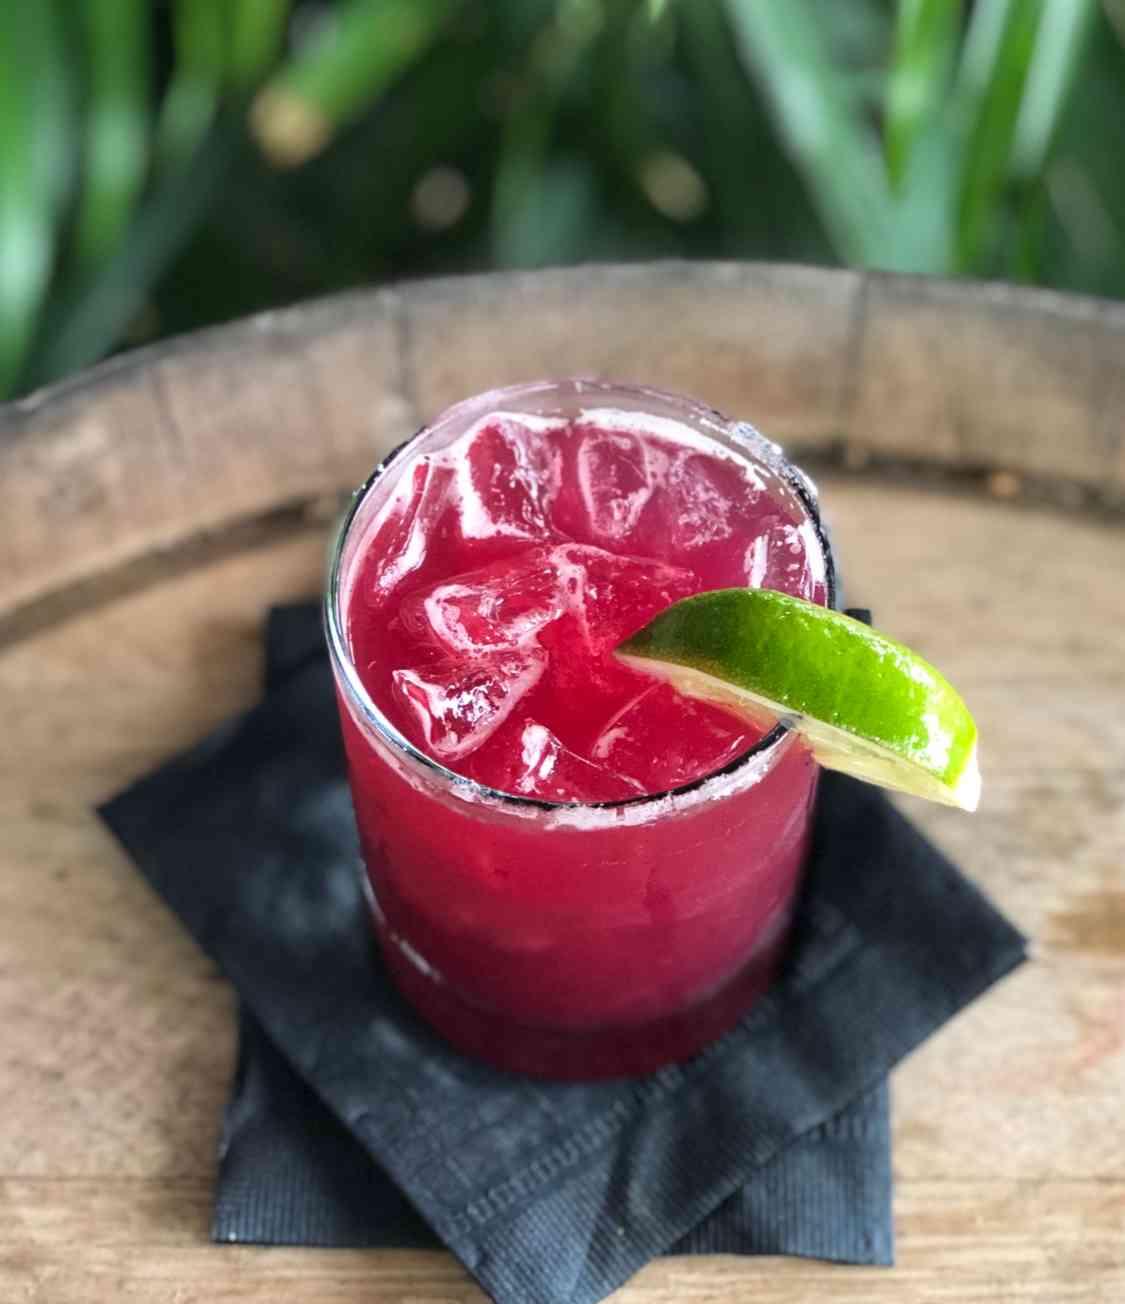 Blueberry Lavendar Cooler